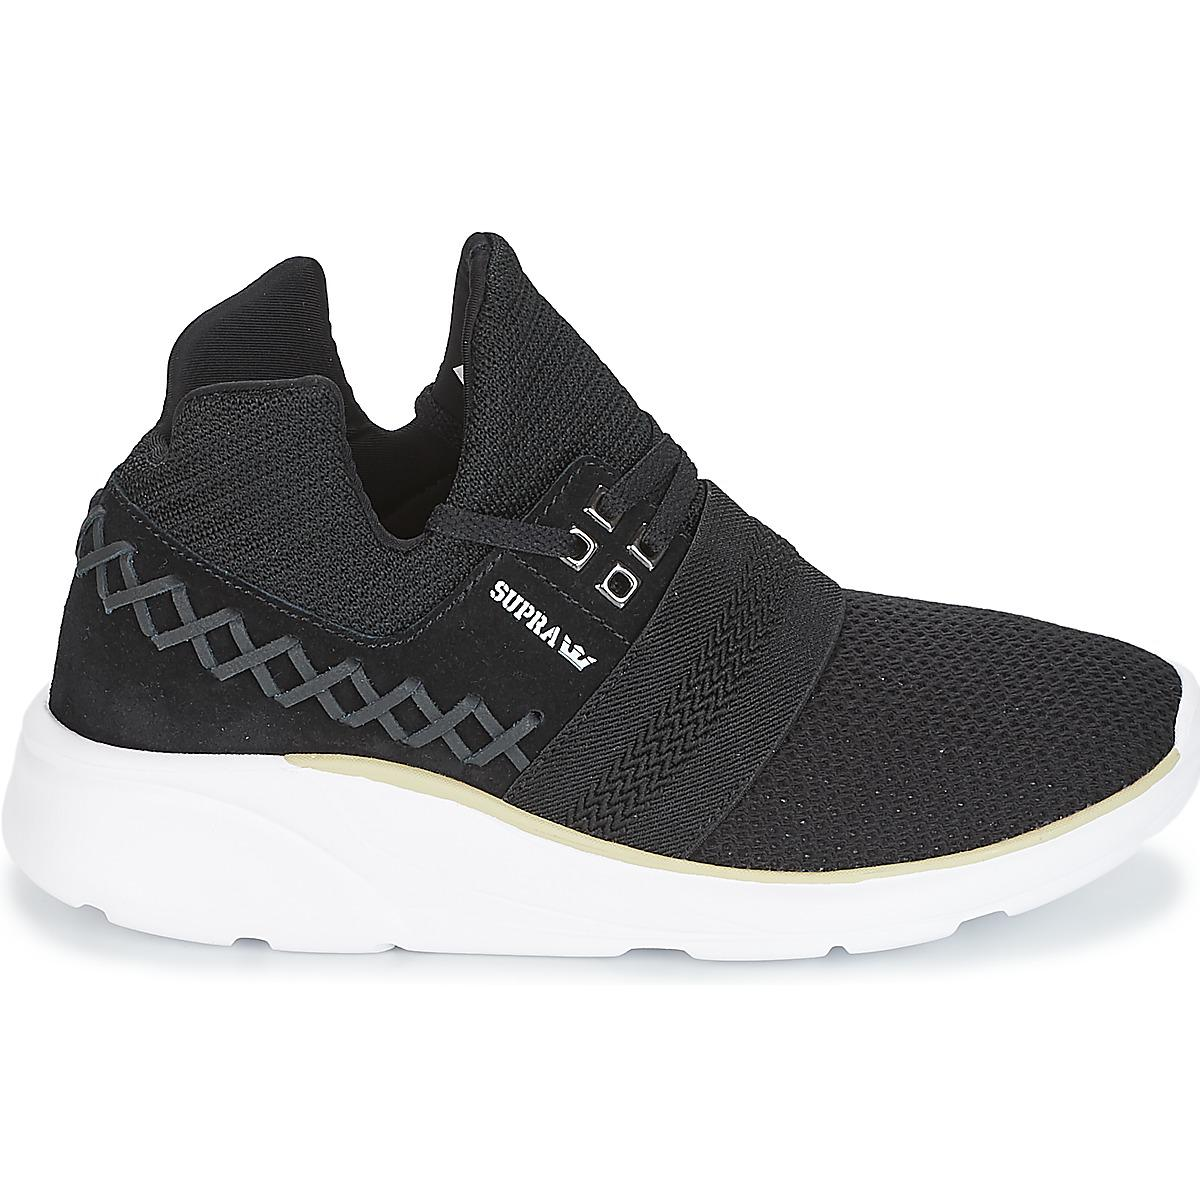 Supra - Catori Women s Shoes (high-top Trainers) In Black - Lyst. View  fullscreen 78fa7ea180